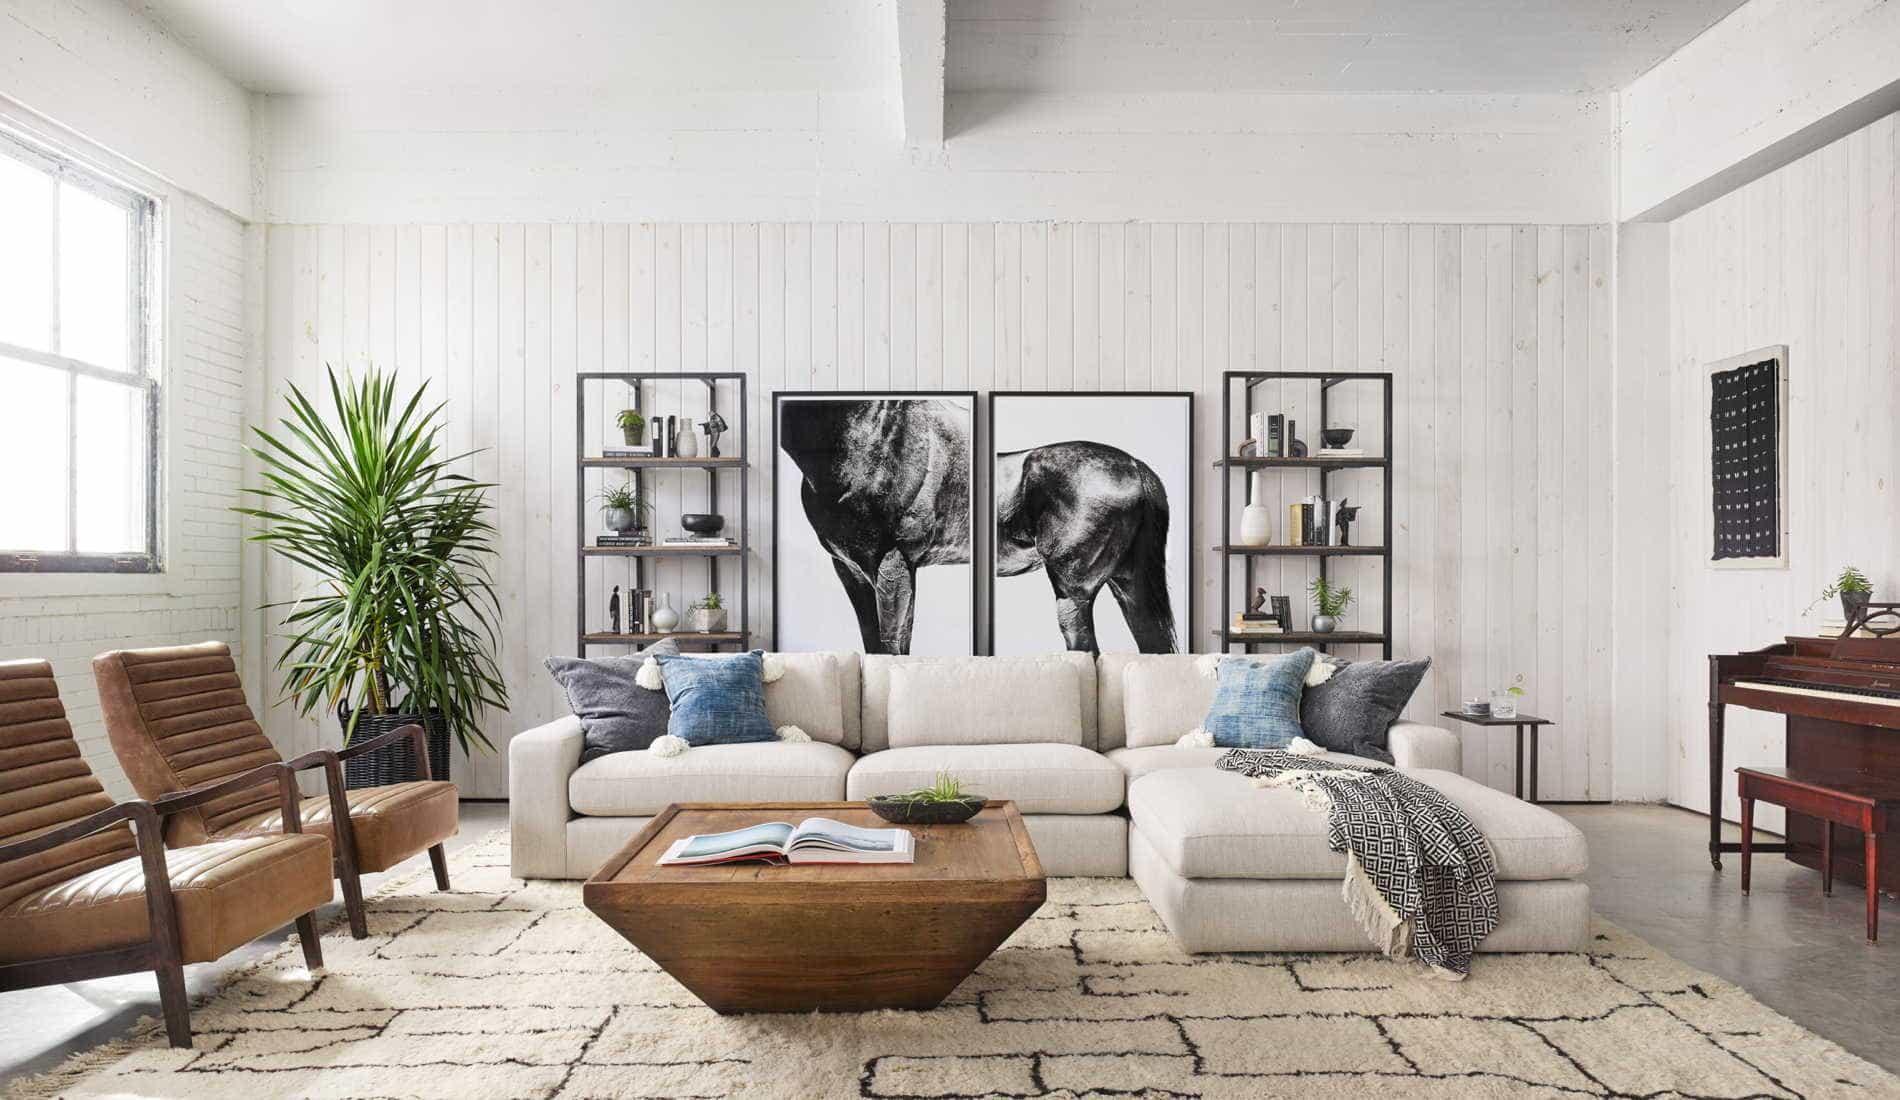 Terra Firma Home interior designer Krissy Millner talks about design trends for 2018 and beyond.